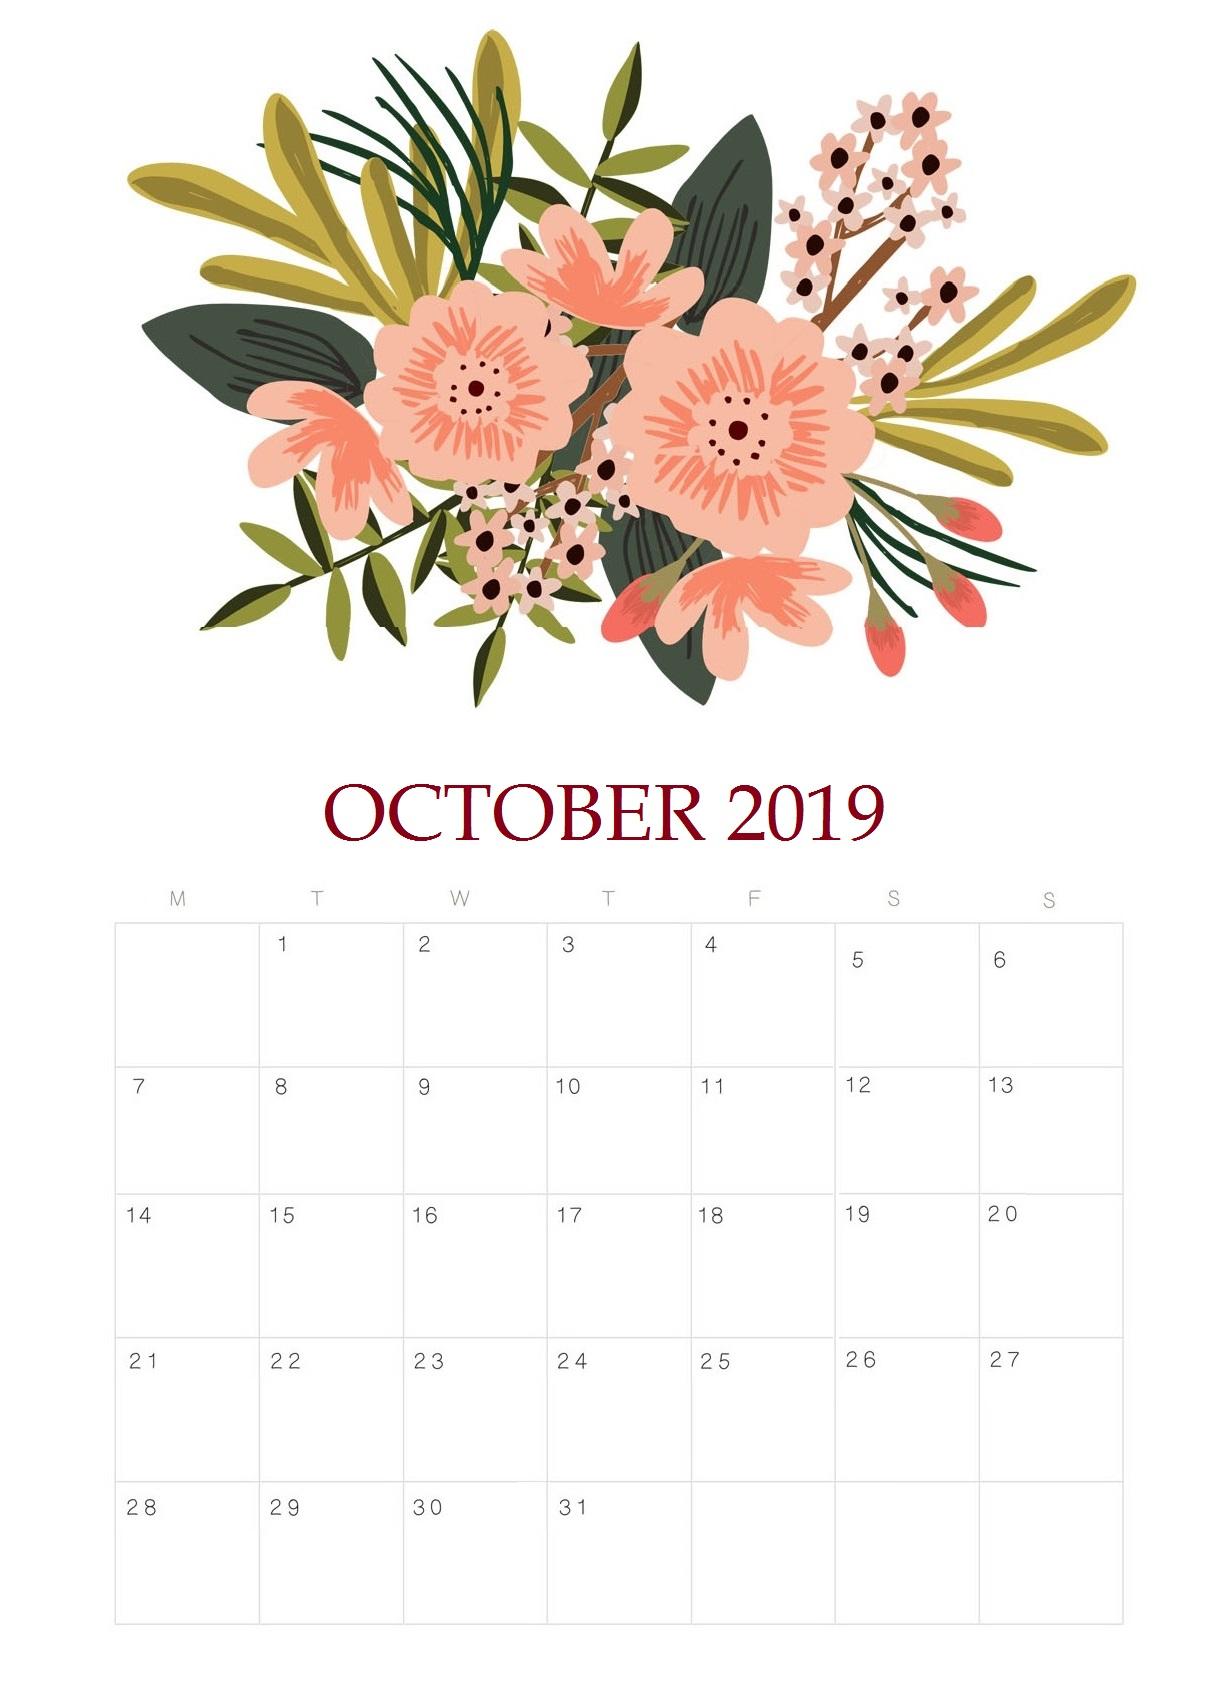 Floral October 2019 Calendar